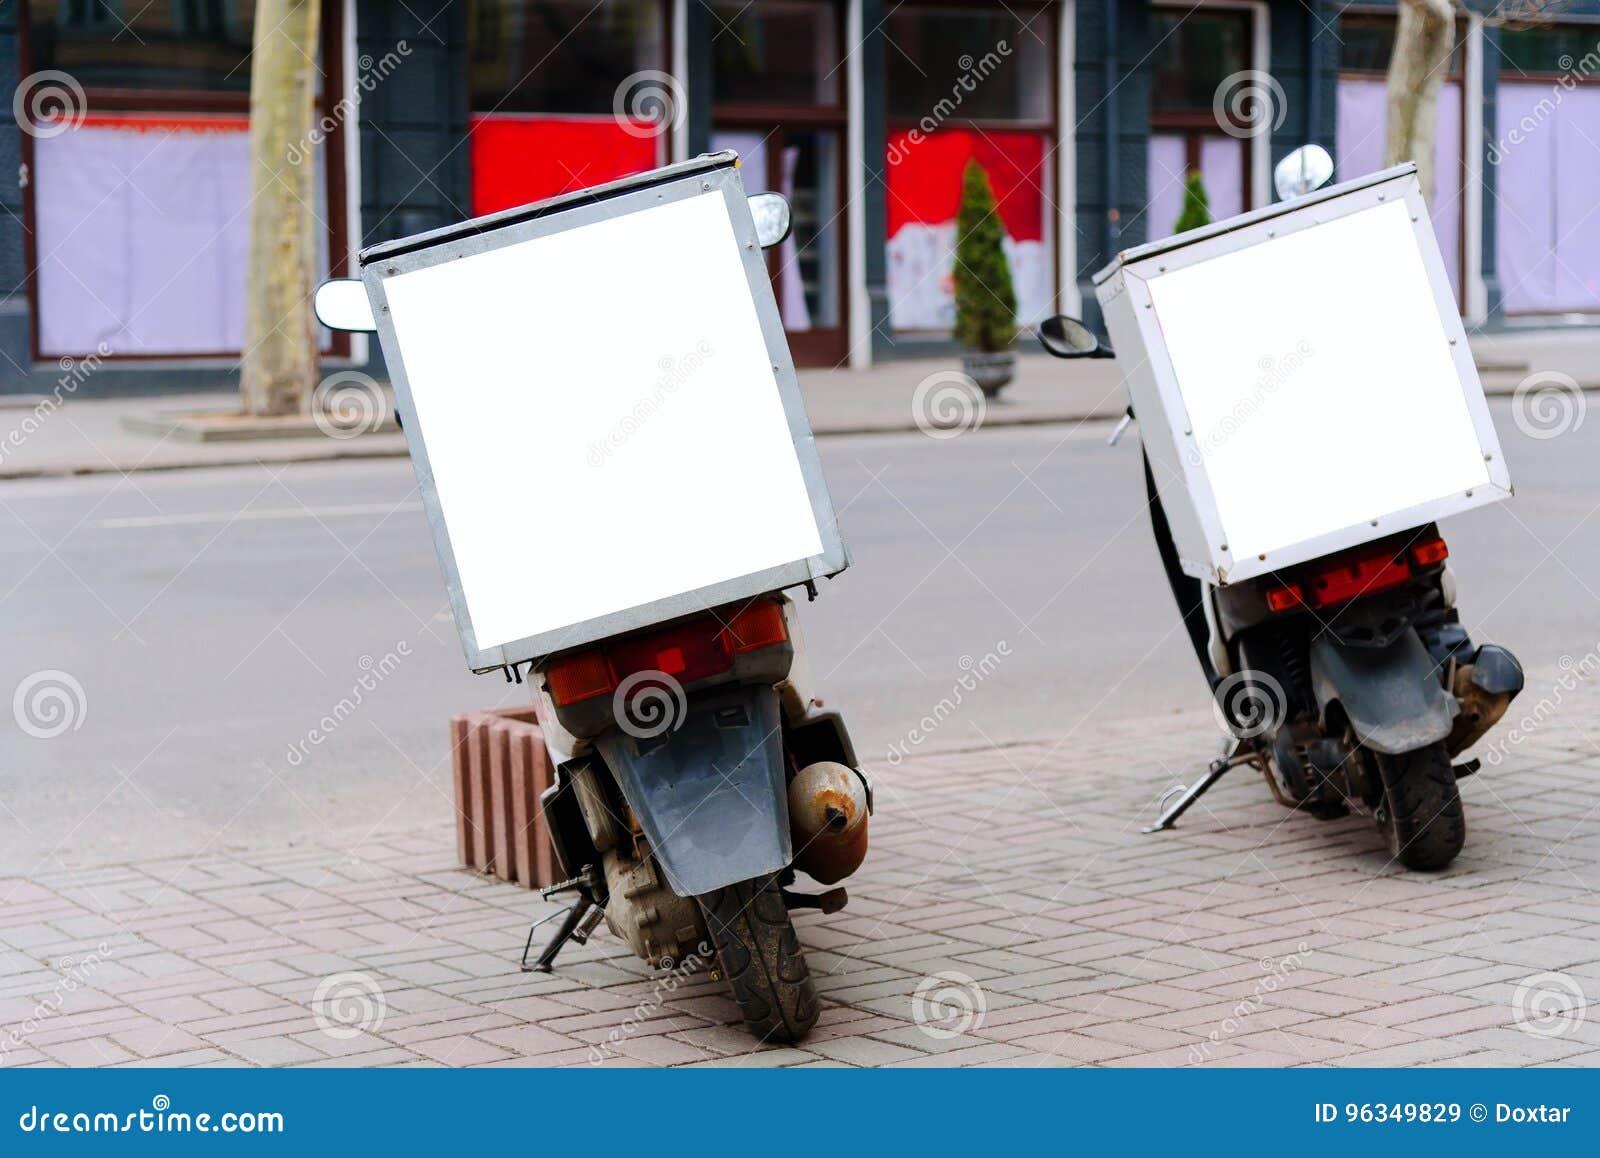 Оказание услуг доставки мопедов припарковало на обочине, вид сзади